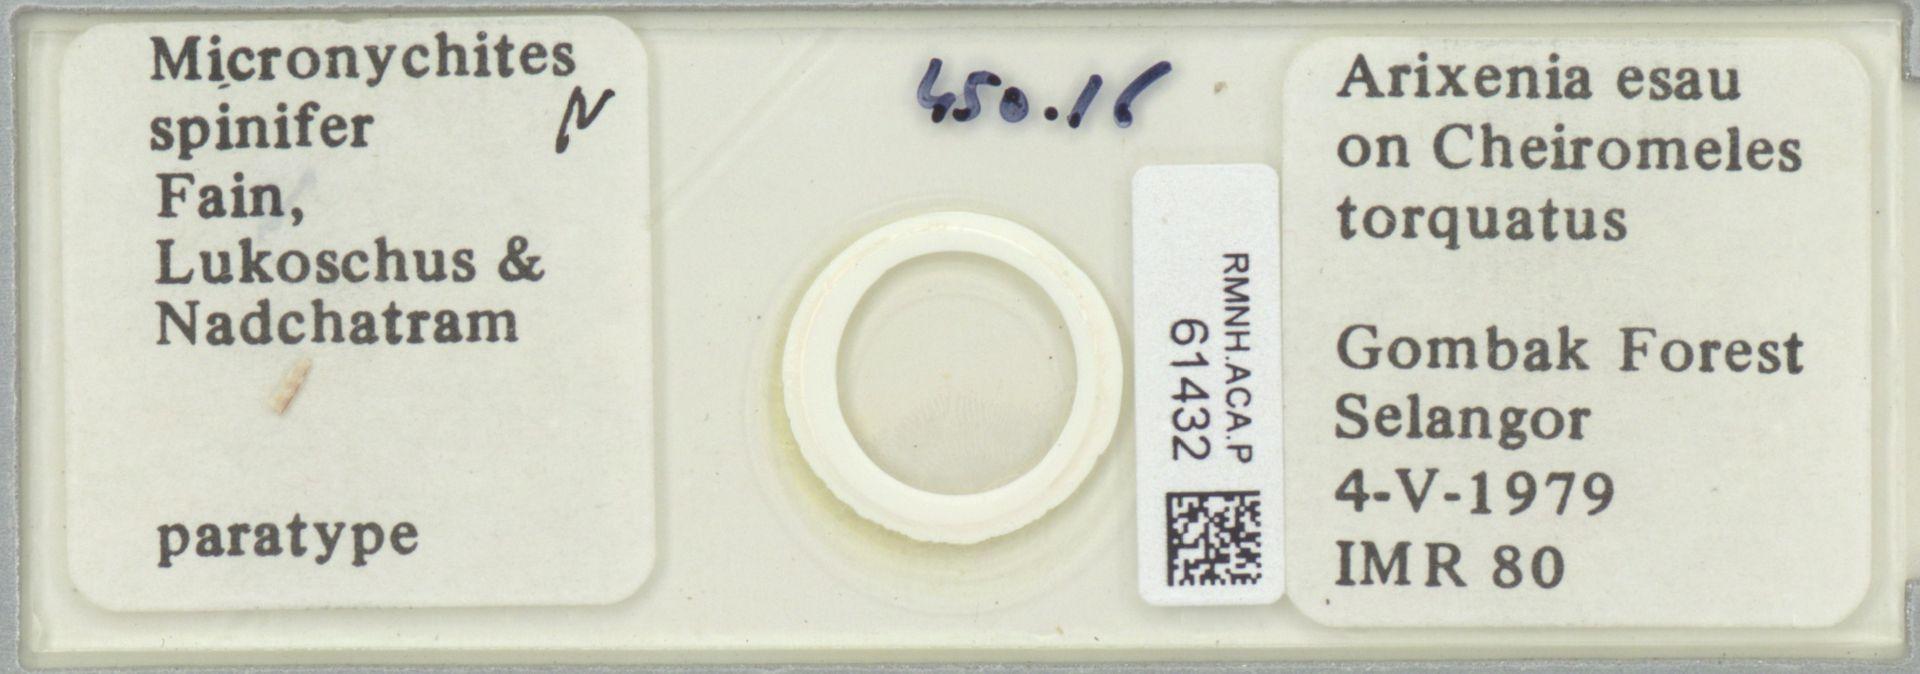 RMNH.ACA.P.61432 | Micronychites spinifer Fain, Lukoschus & Nadchatram